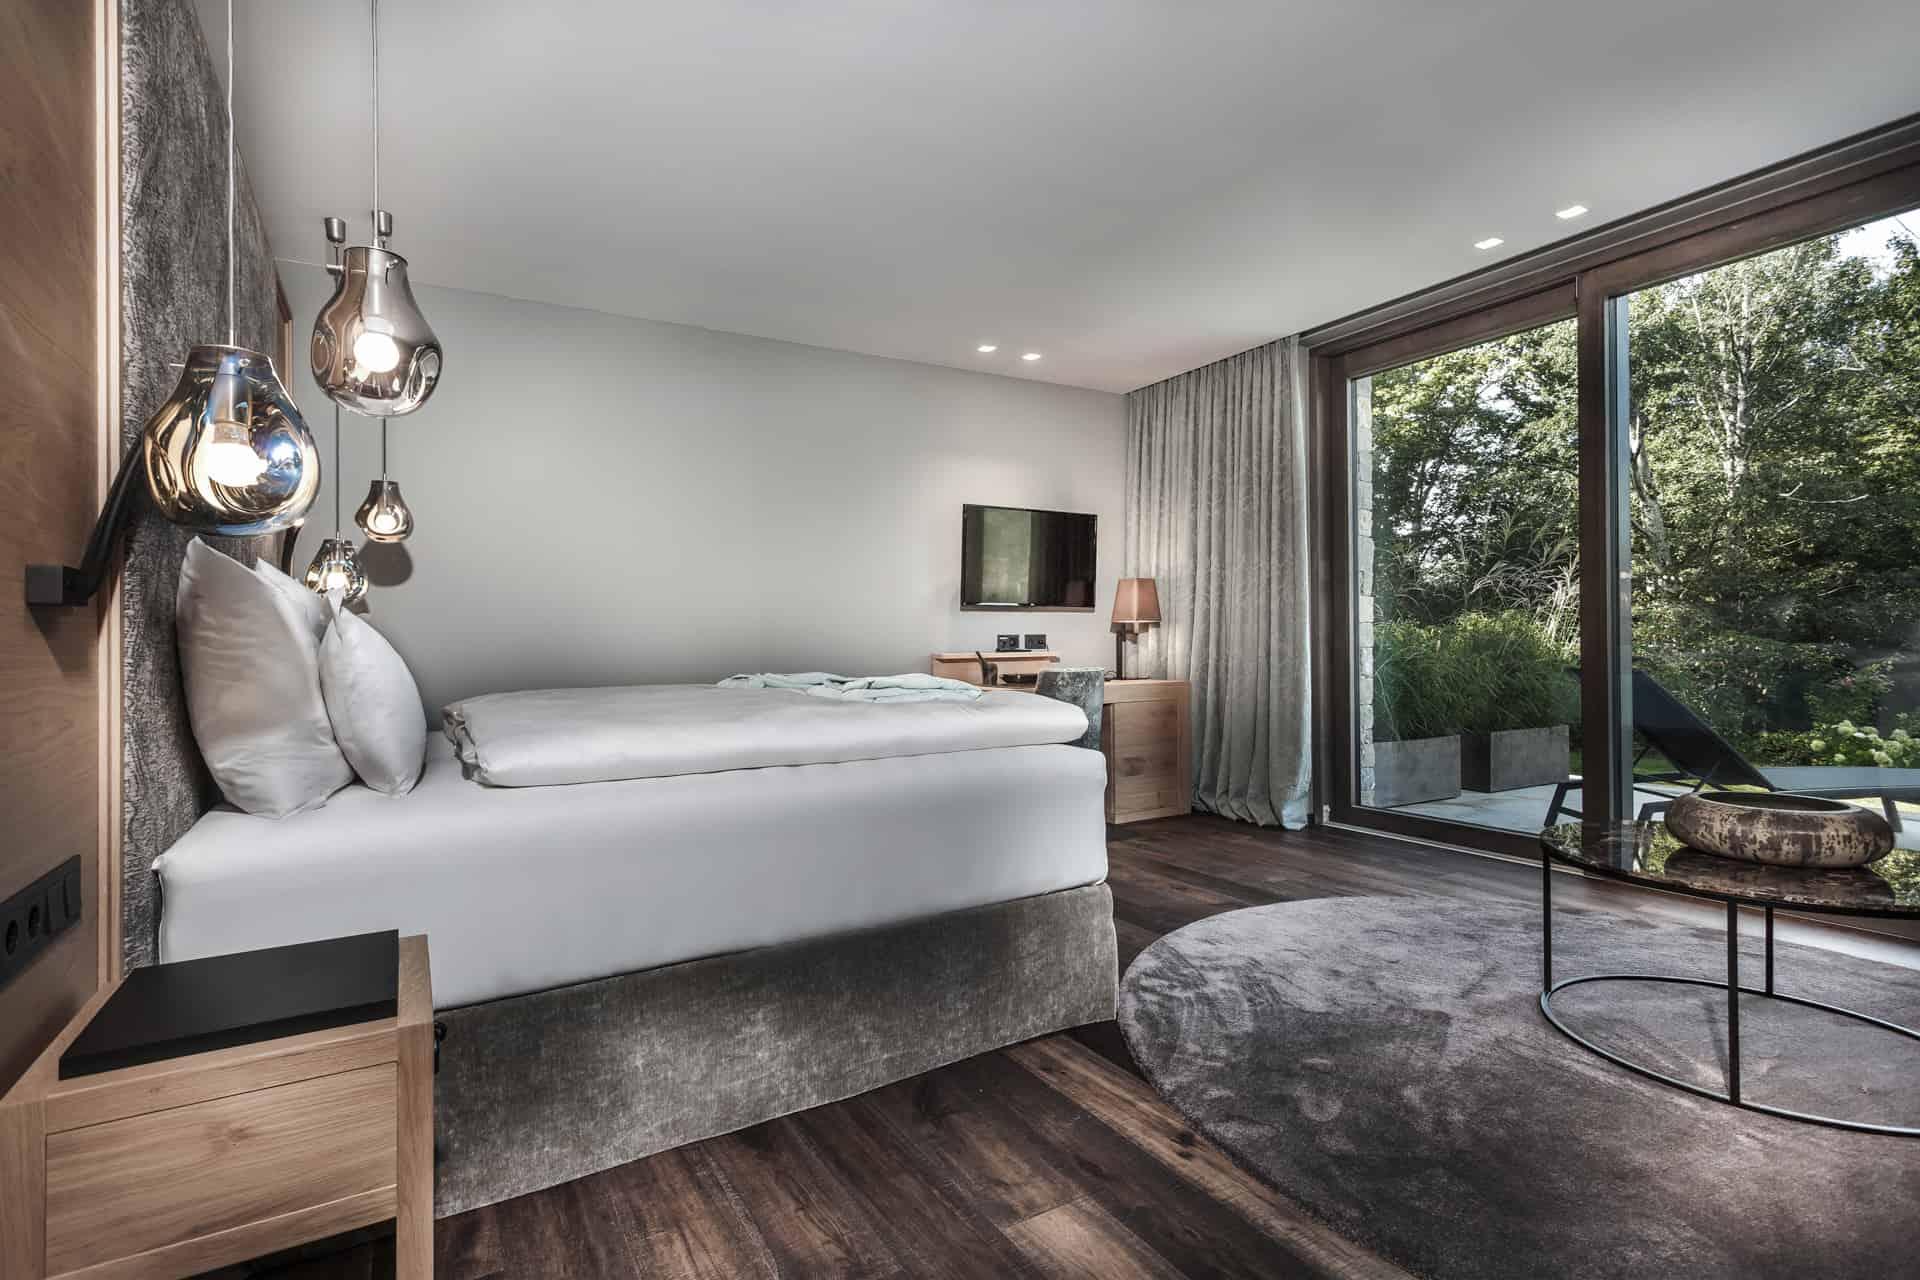 lakeside-suites-3